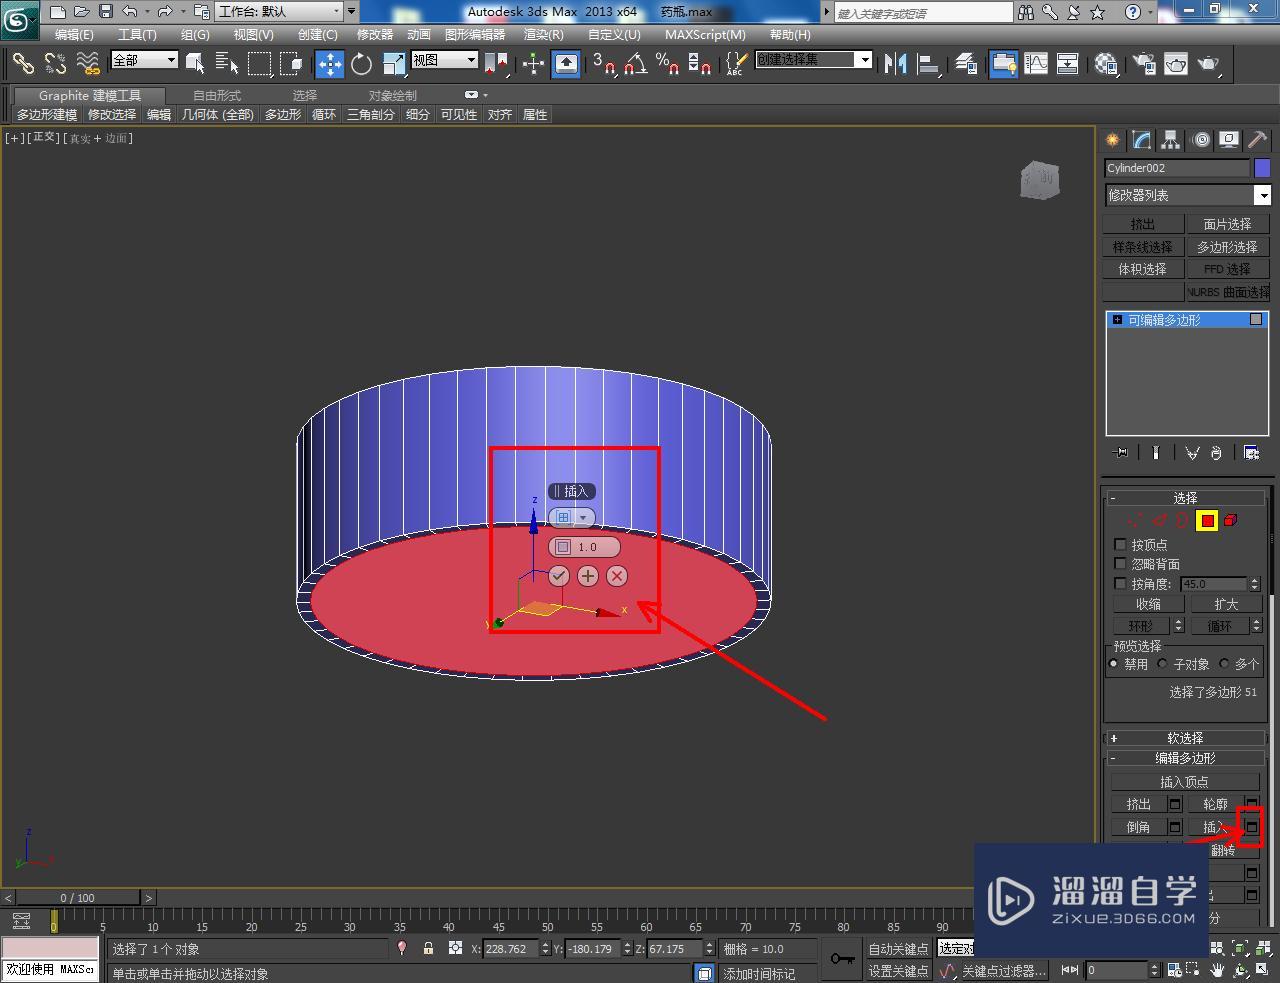 3DMax药瓶瓶盖模型制作教程